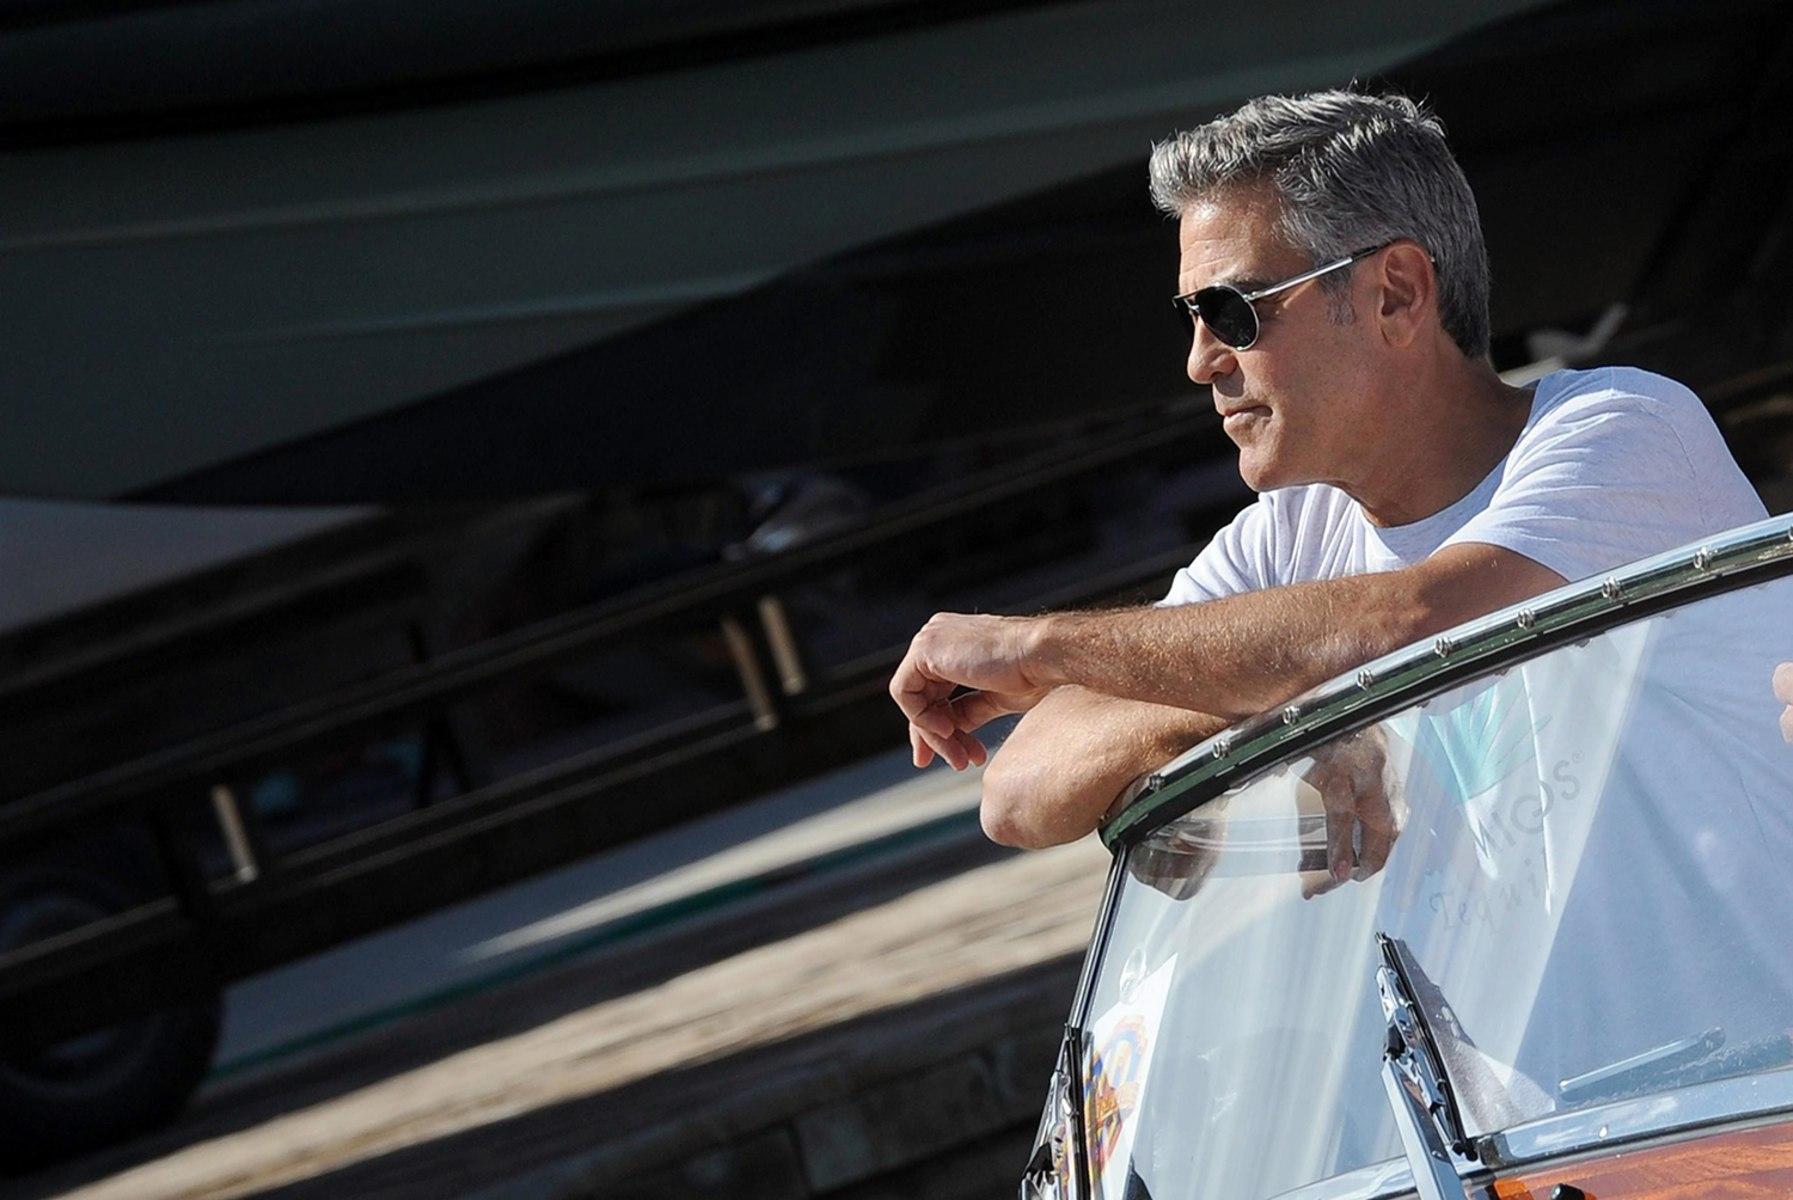 George Clooney Marries Amal Alamuddin In Venice Wedding